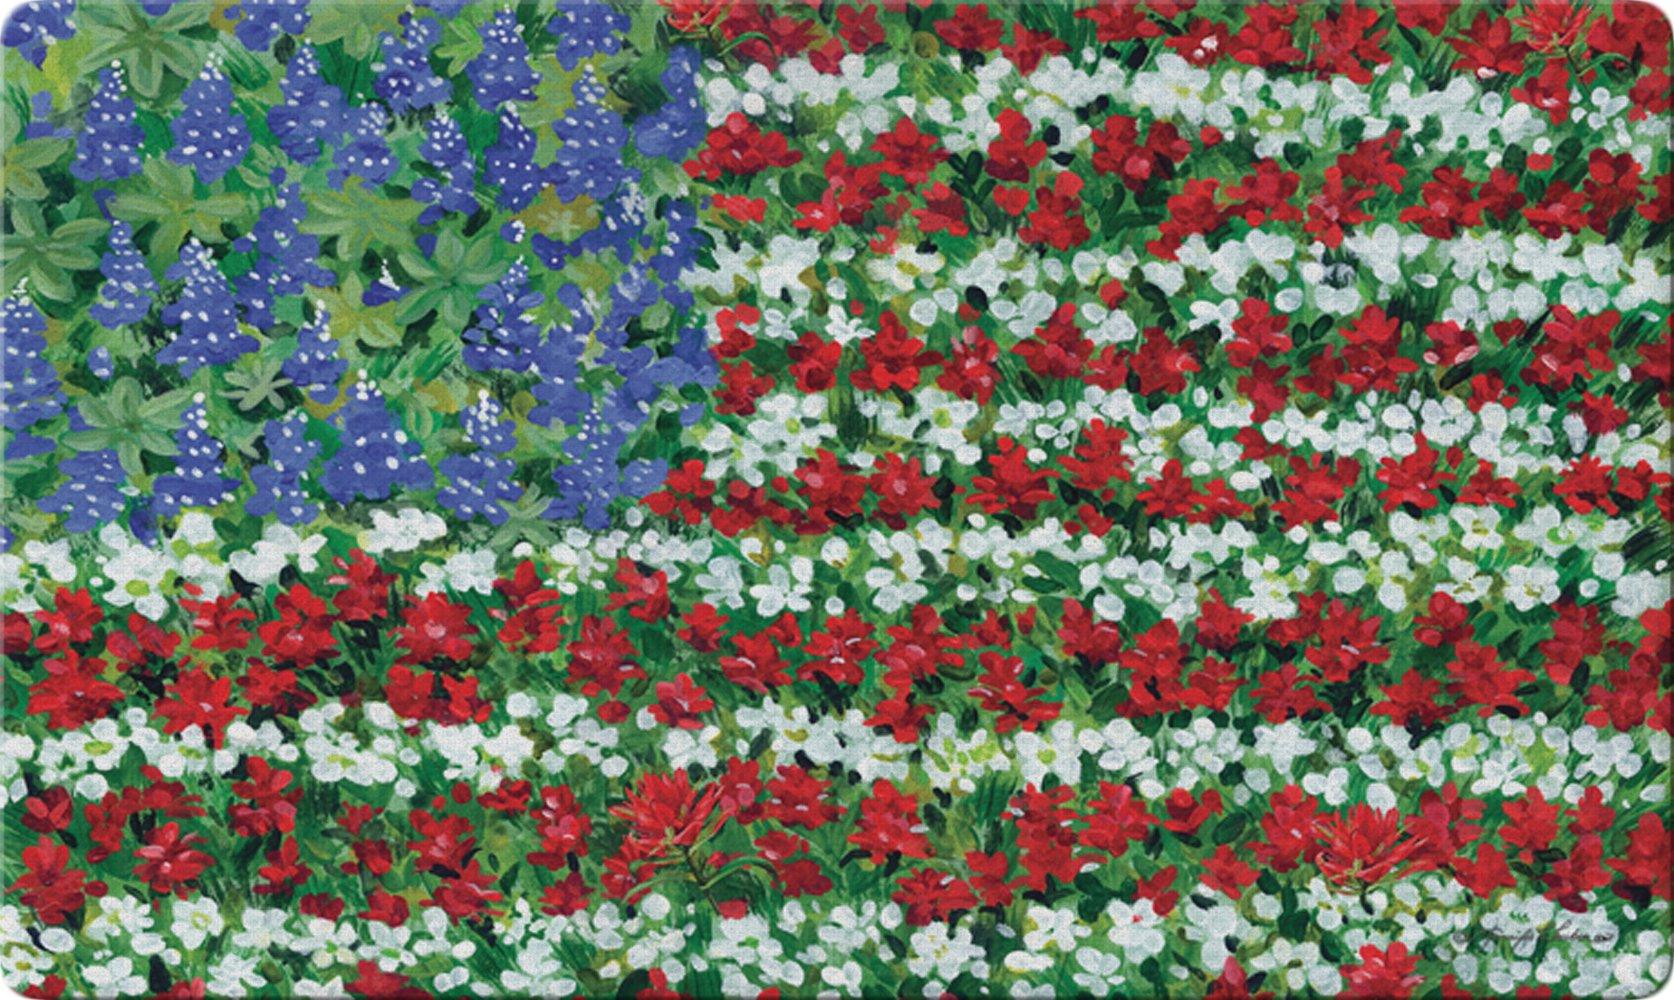 Toland Home Garden Field of Glory 18 x 30 Inch Decorative Floor Mat Flower Patriotic USA America Floral Doormat